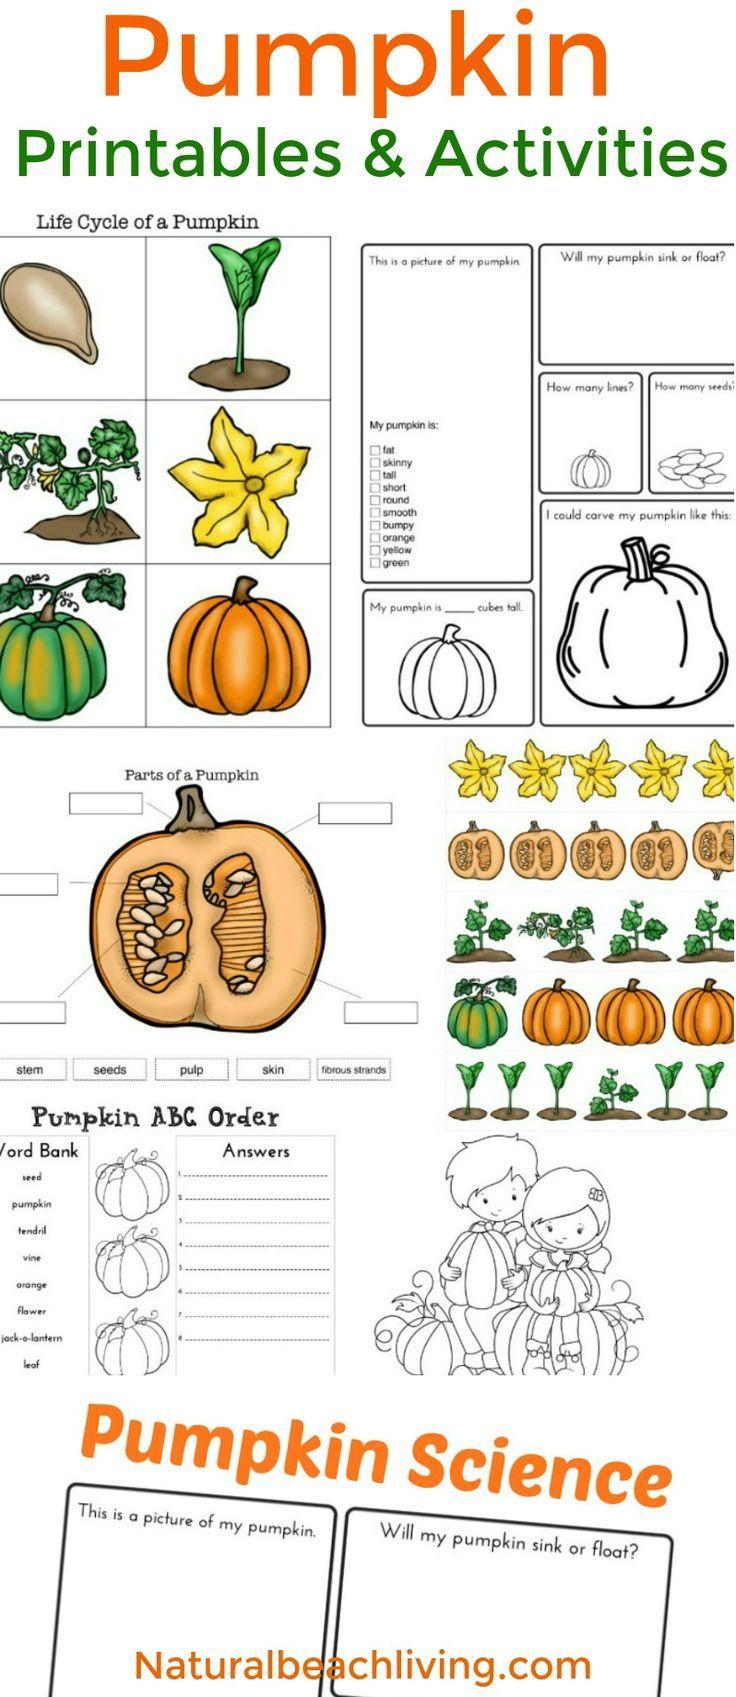 The Best Pumpkin Activities for Kids (STEM